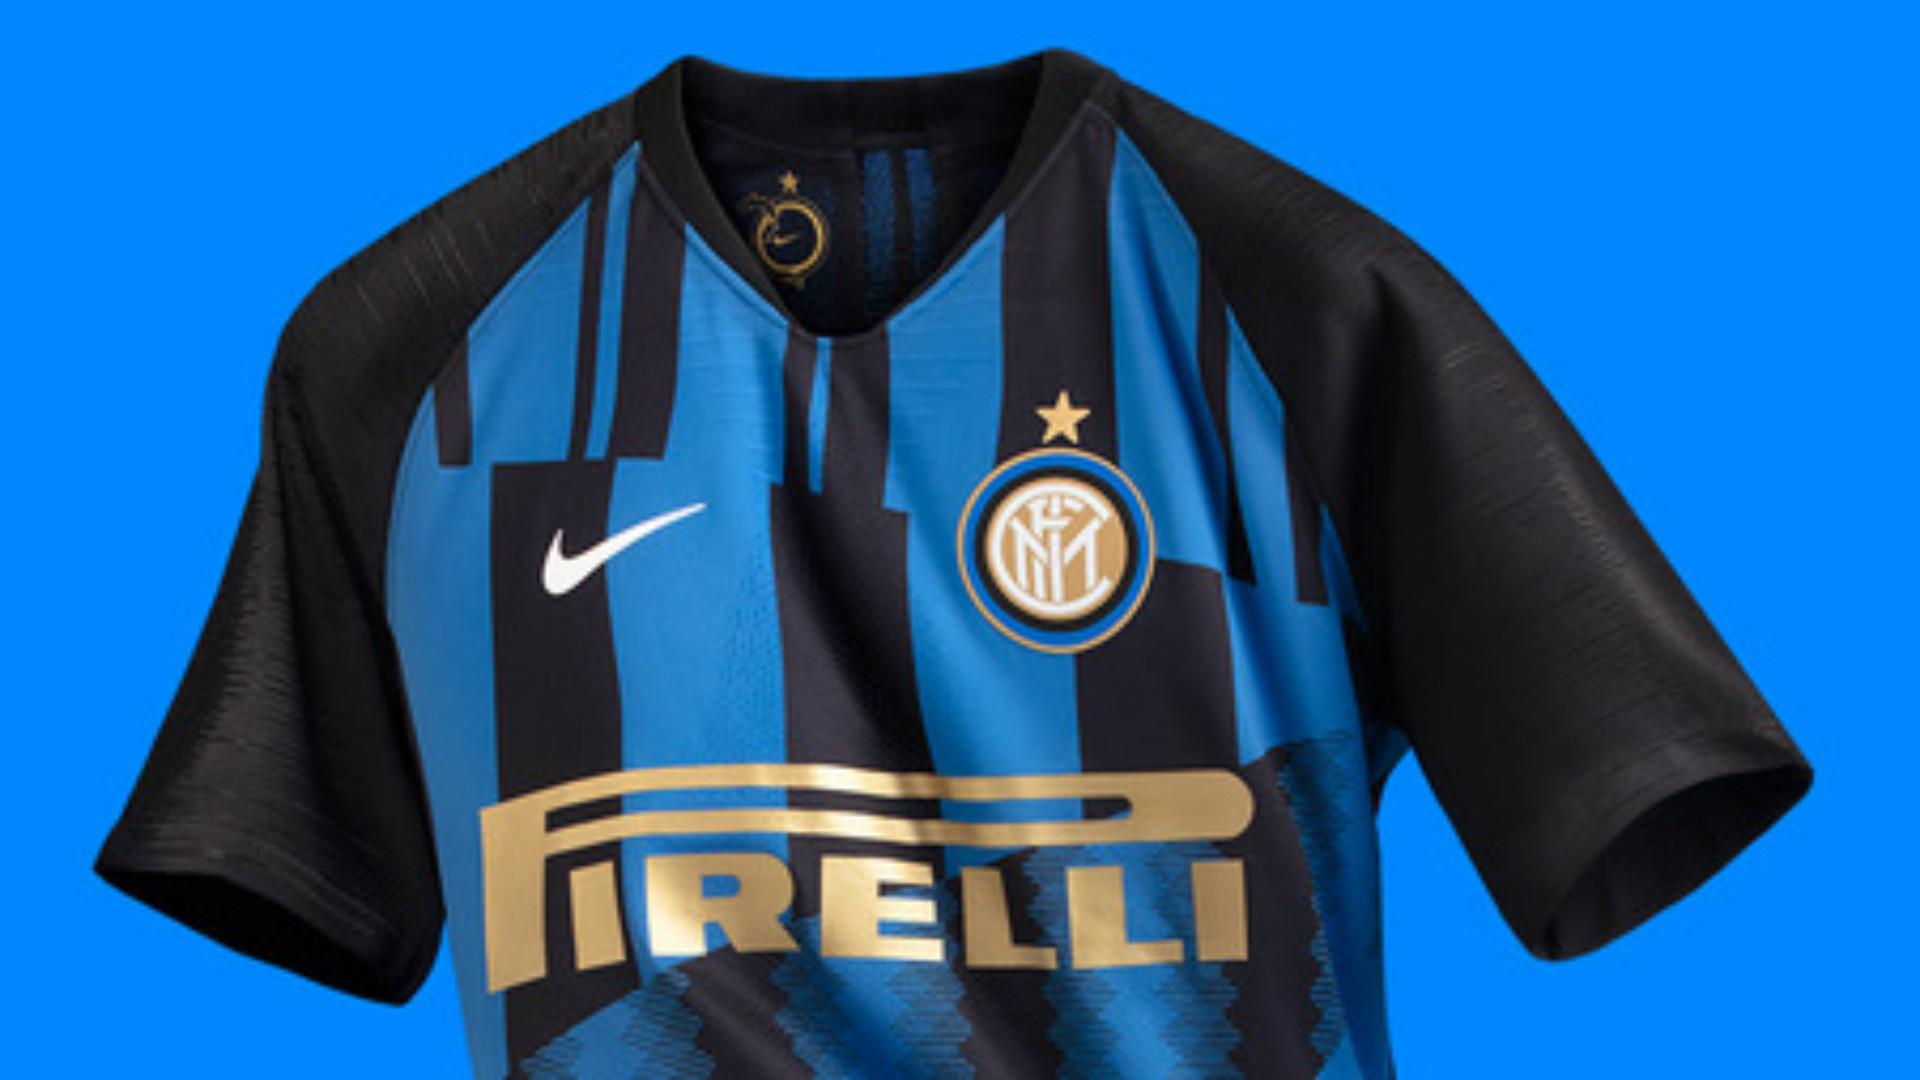 Maglia Inter 2018 2019, Nike celebra i 20 anni di partnership